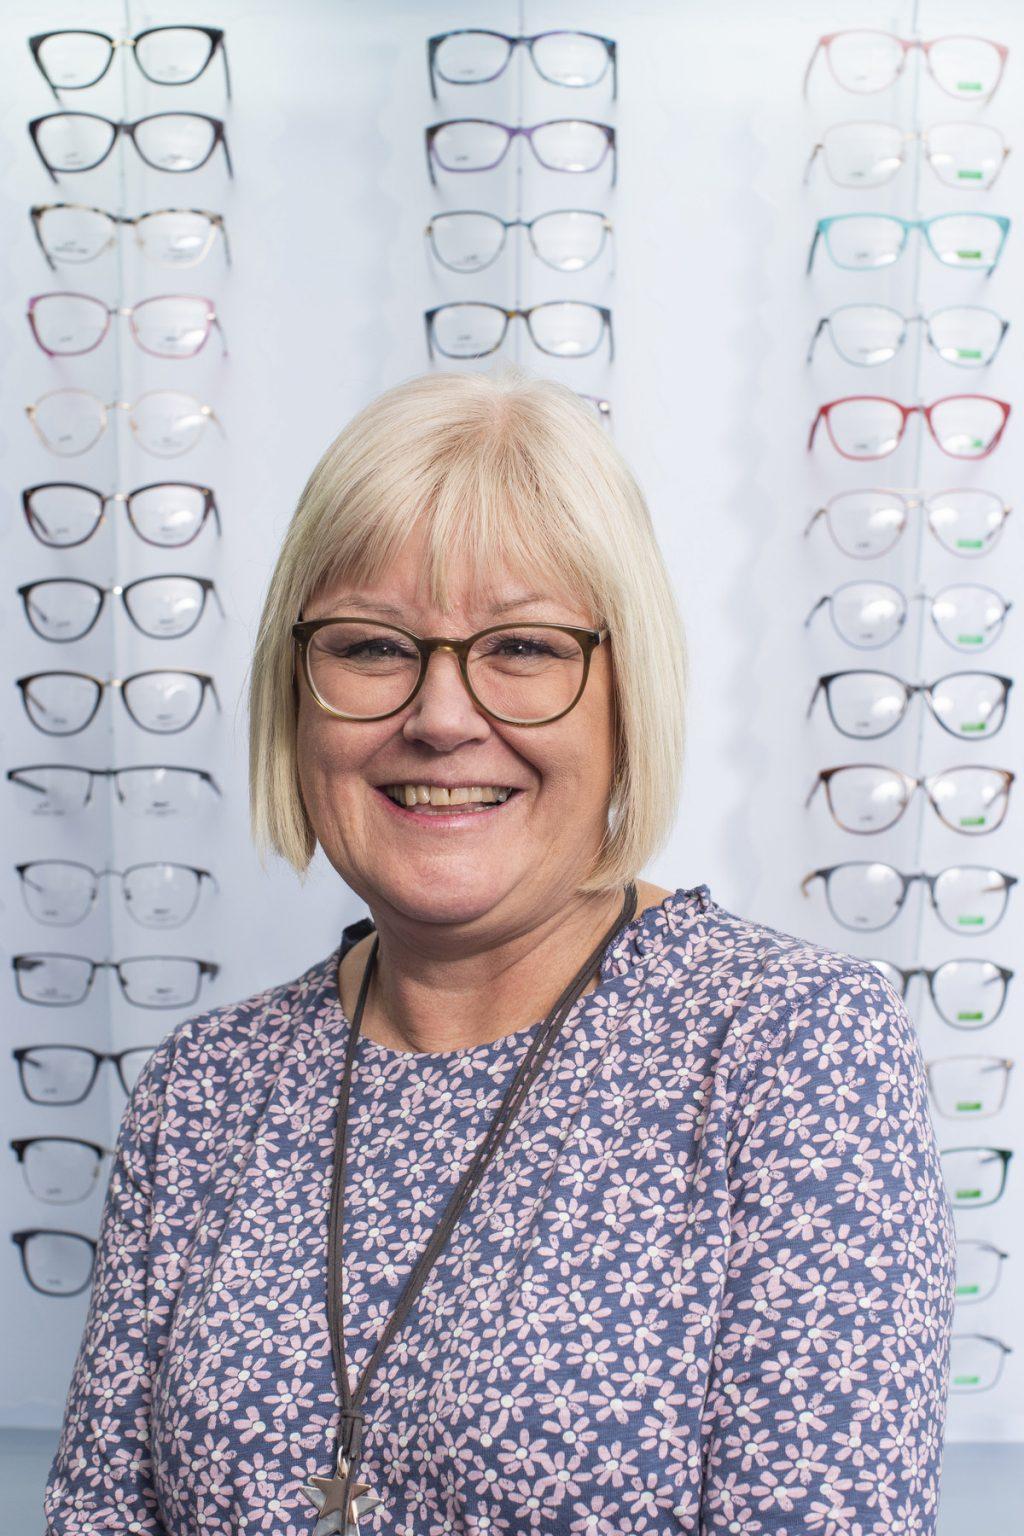 Photo of Melanie, an Optical Assistant at Eye Folk